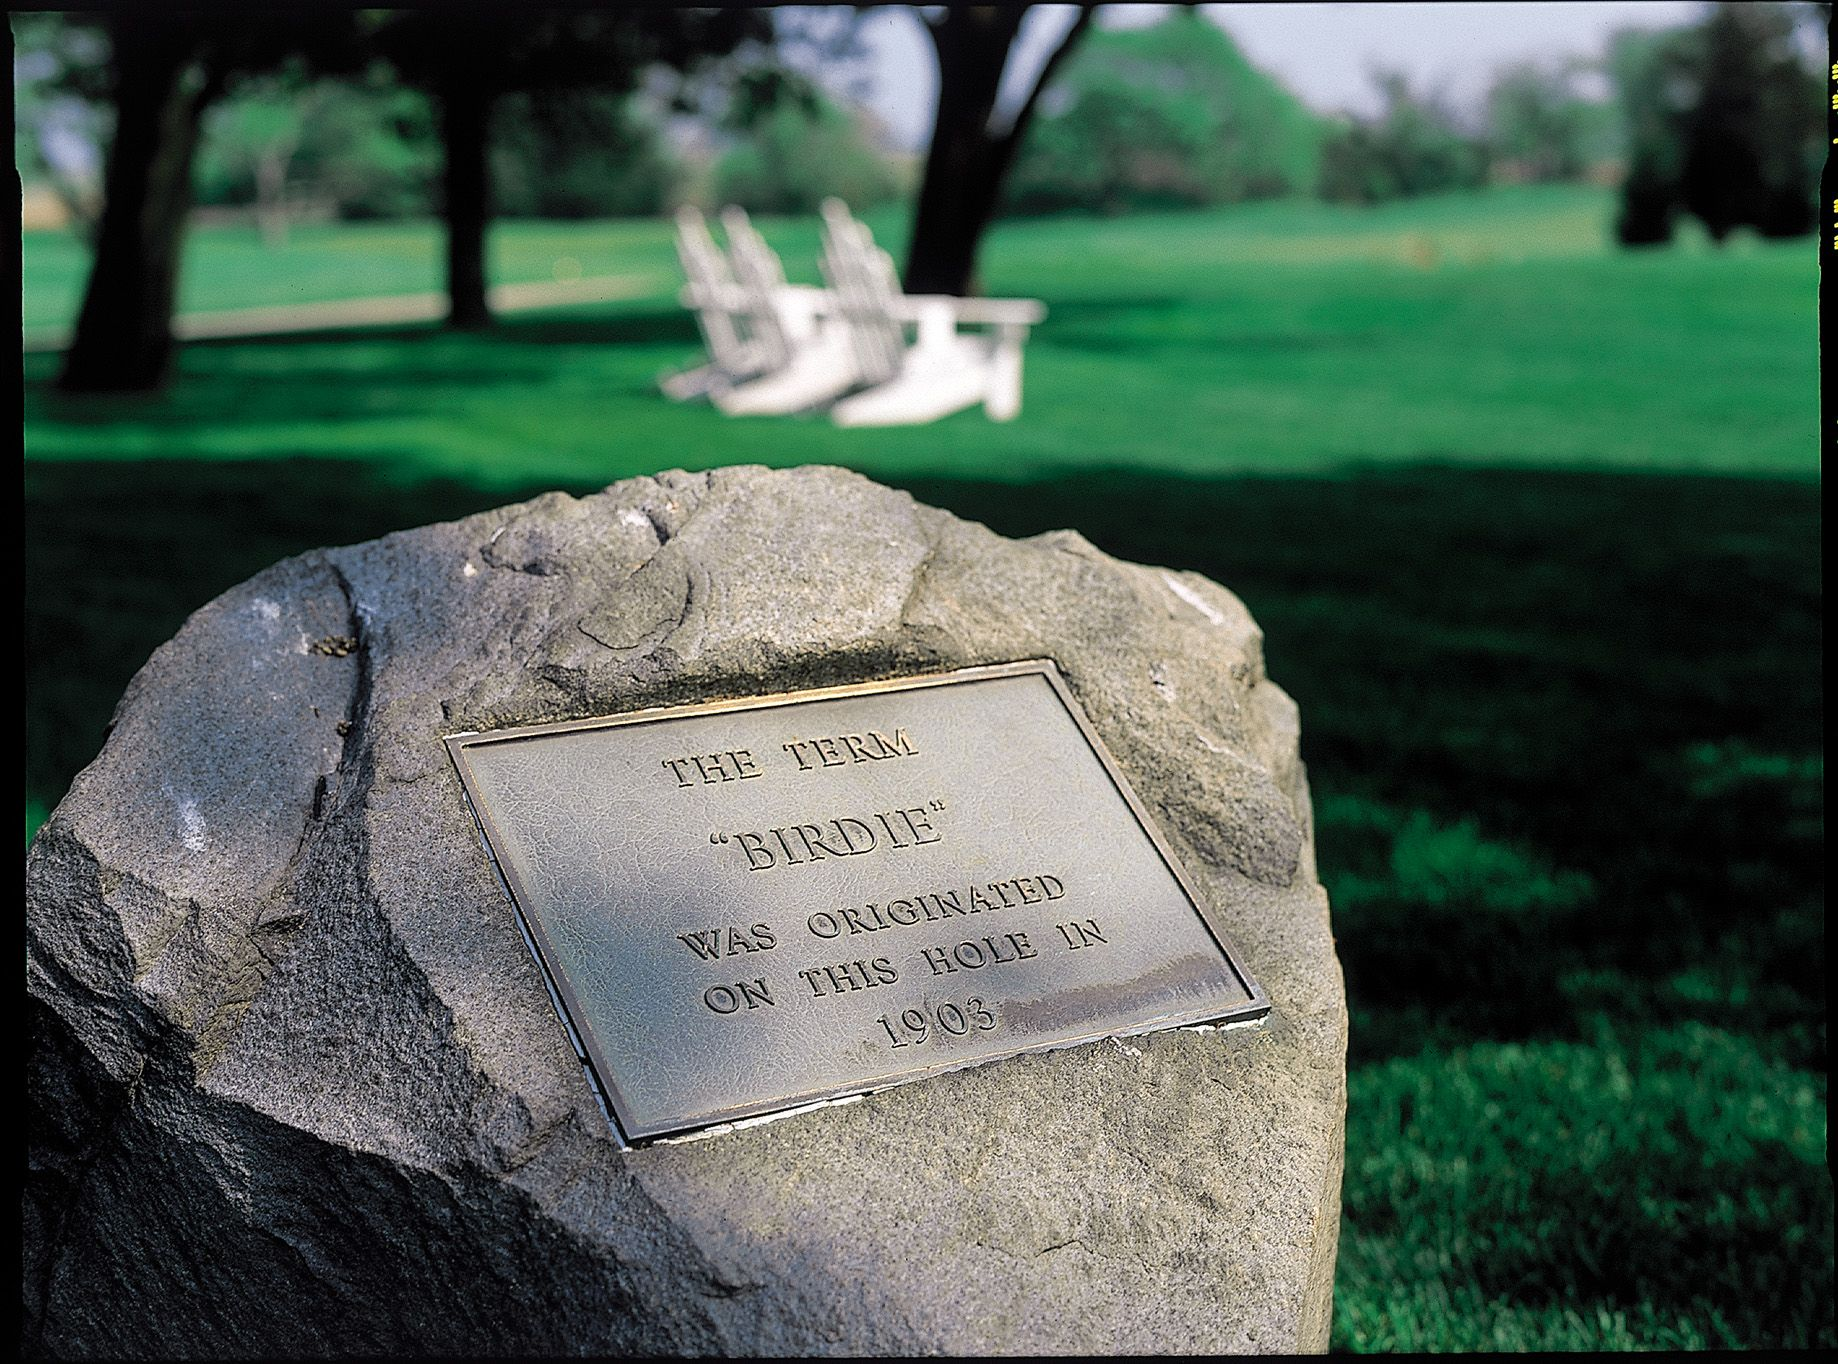 Atlantic City Country Club 1 Leo Fraser Drive Northfield Nj 08225 Golf Golf Putting Tips Golf Terms